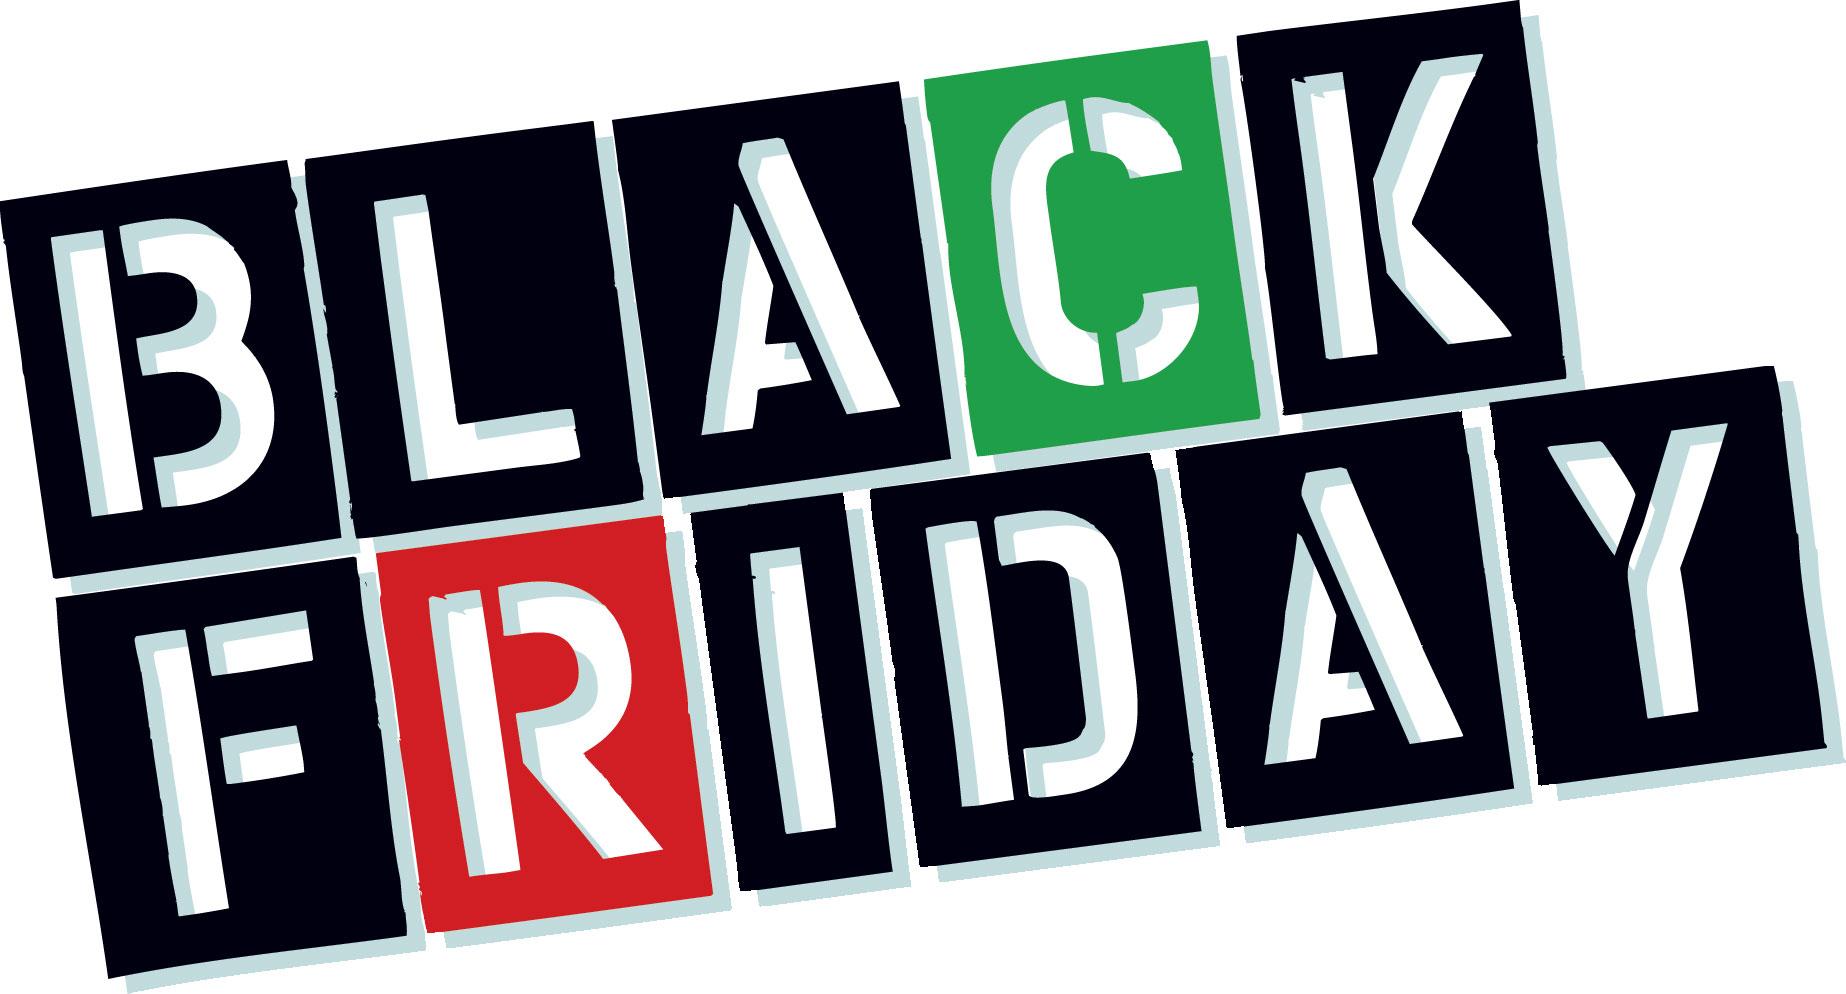 Descuento BlackFriday Palencia Cuchillería 10% descuento BlackFriday Viernes 24 Noviembre 2017